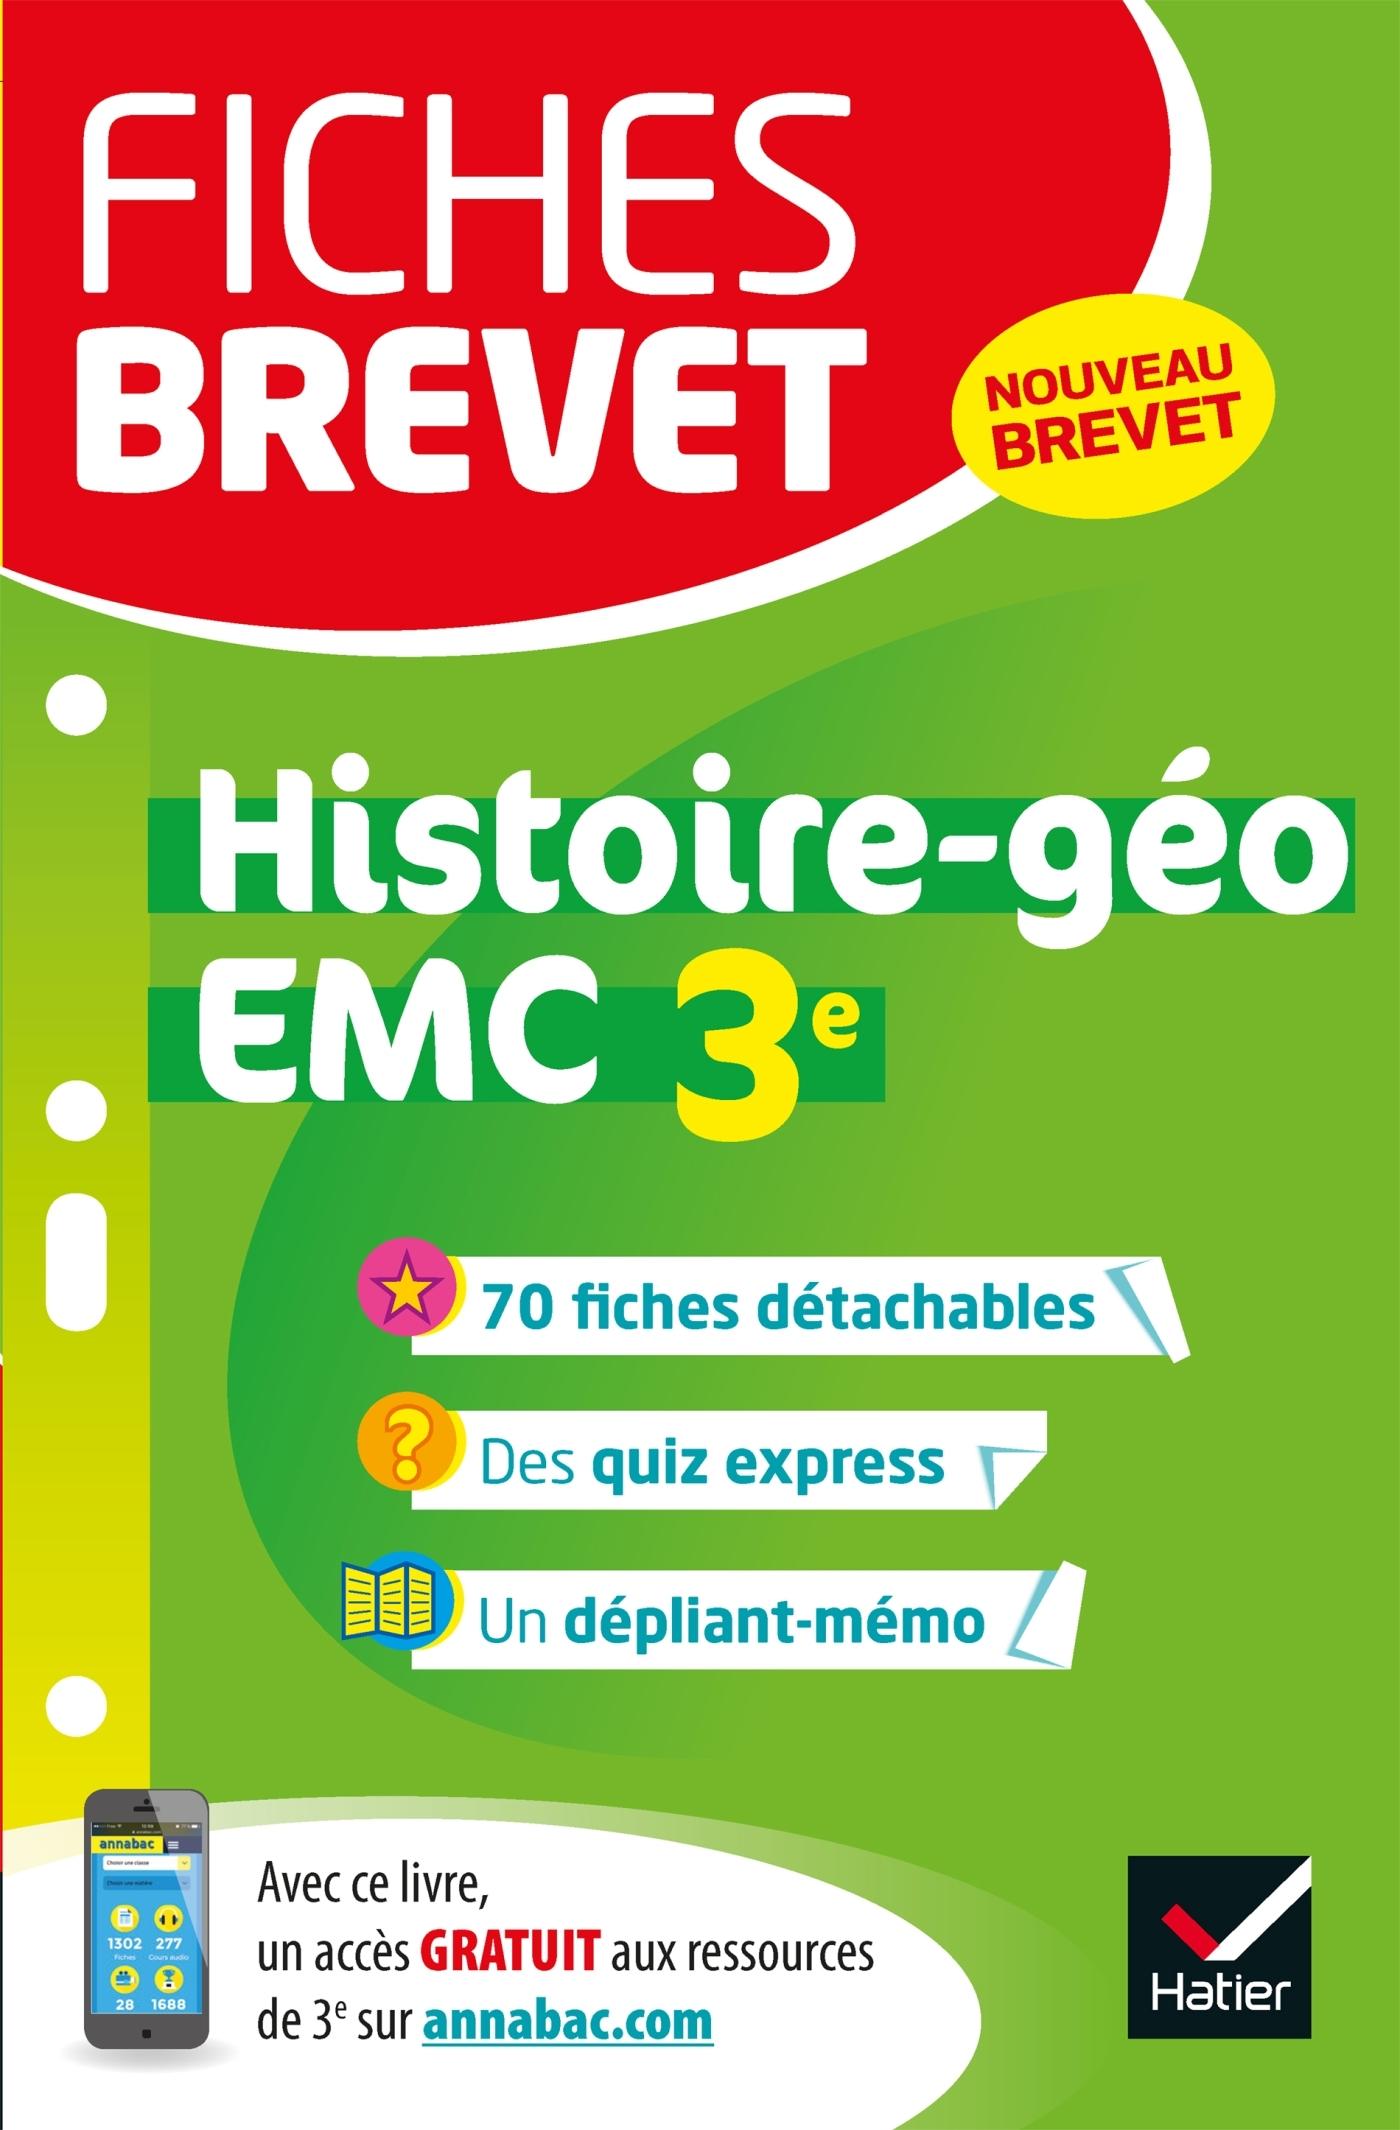 FICHES BREVET HISTOIRE-GEOGRAPHIE EMC 3E